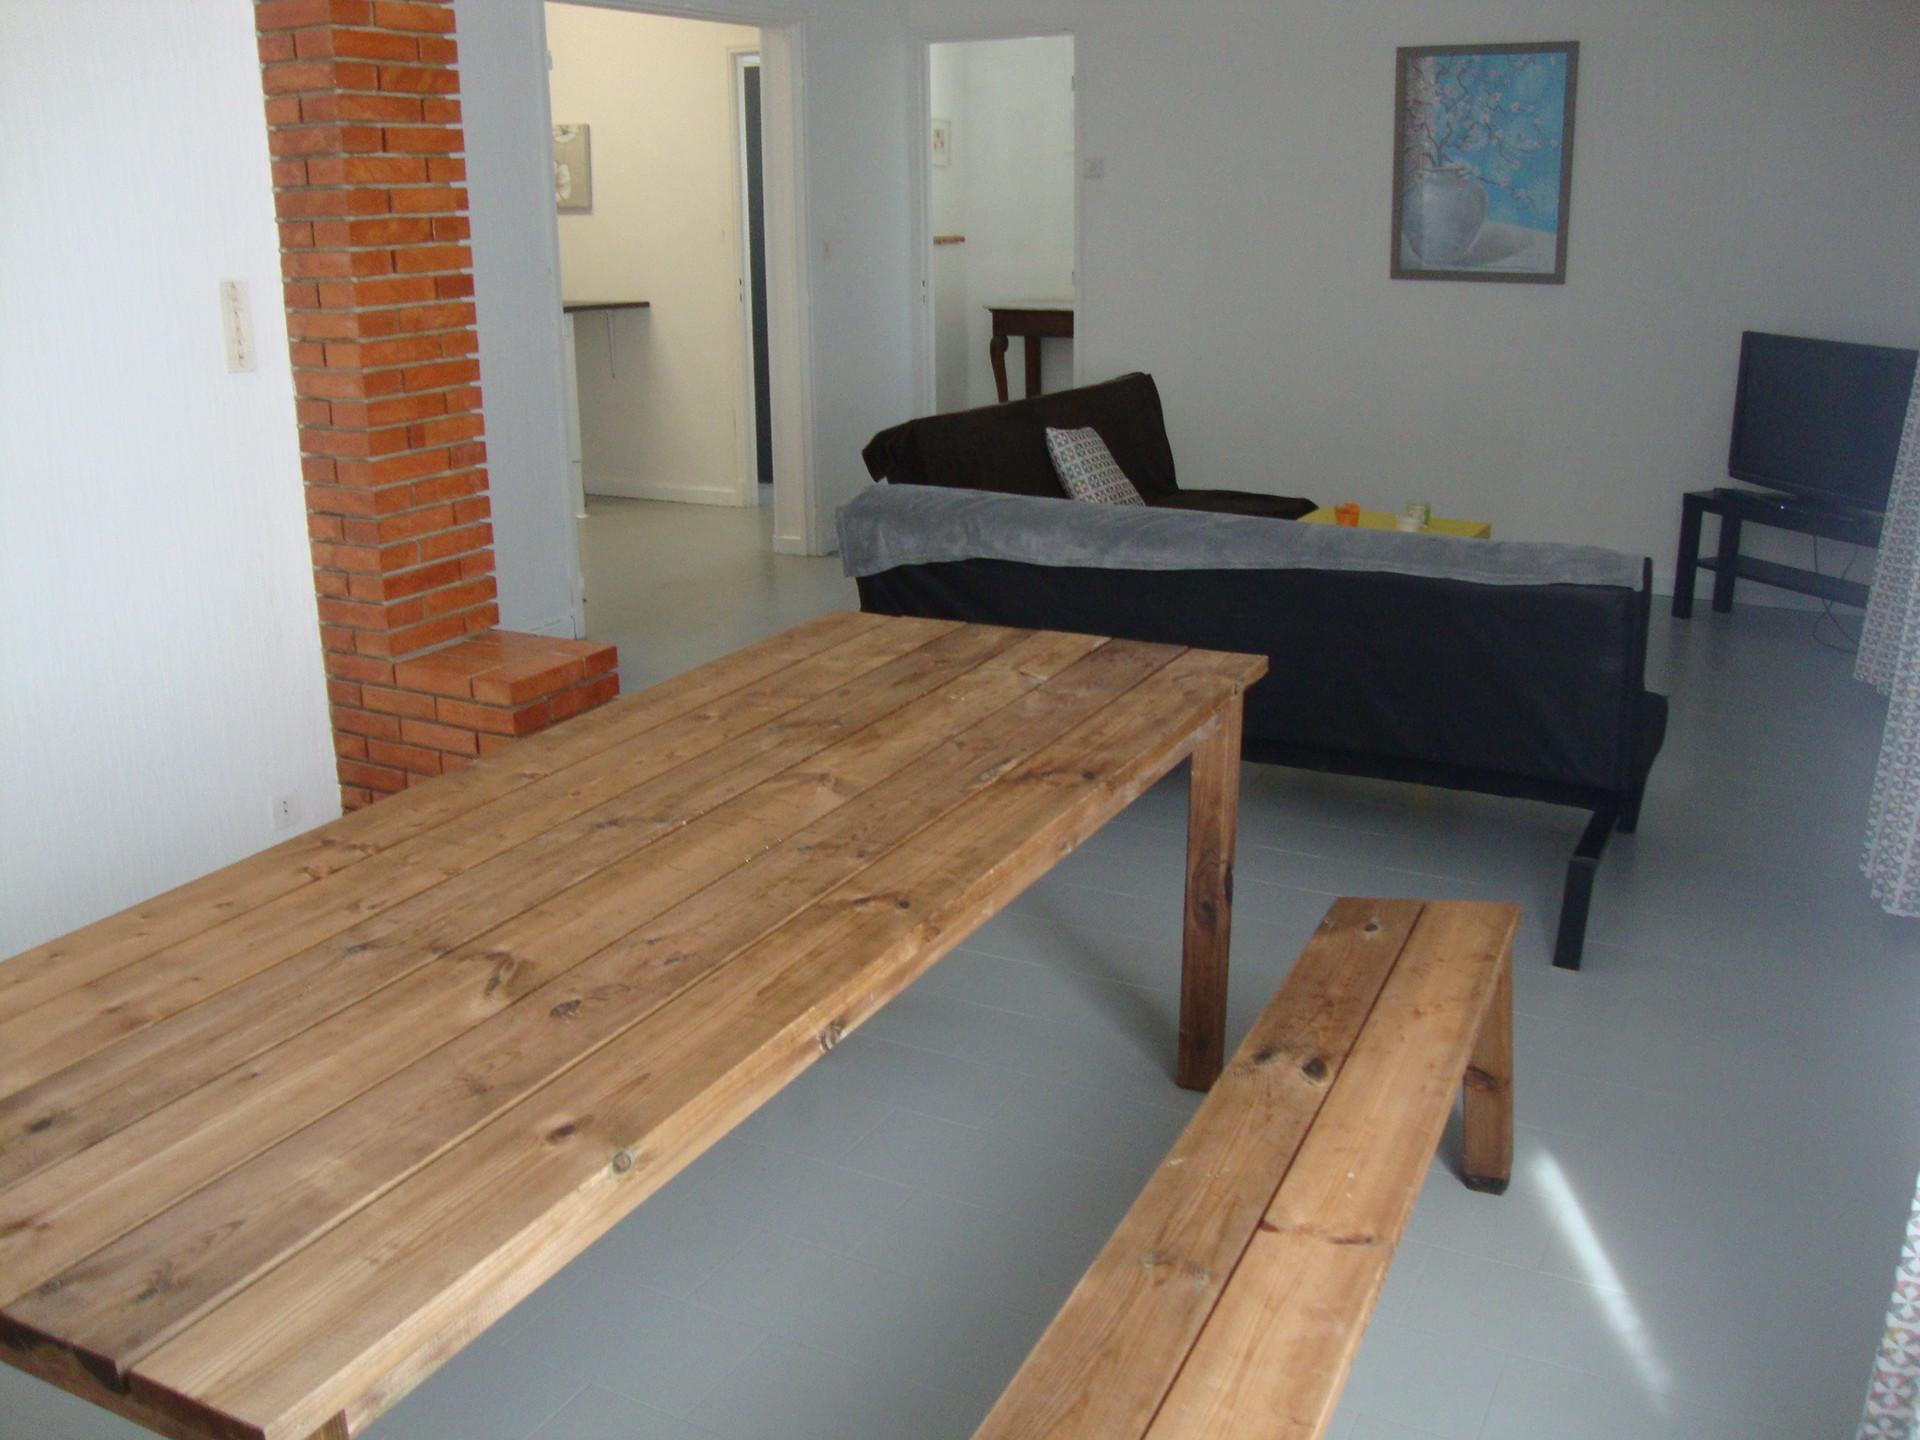 1 chambre dans villa 100 m2 et piscine proche avignon